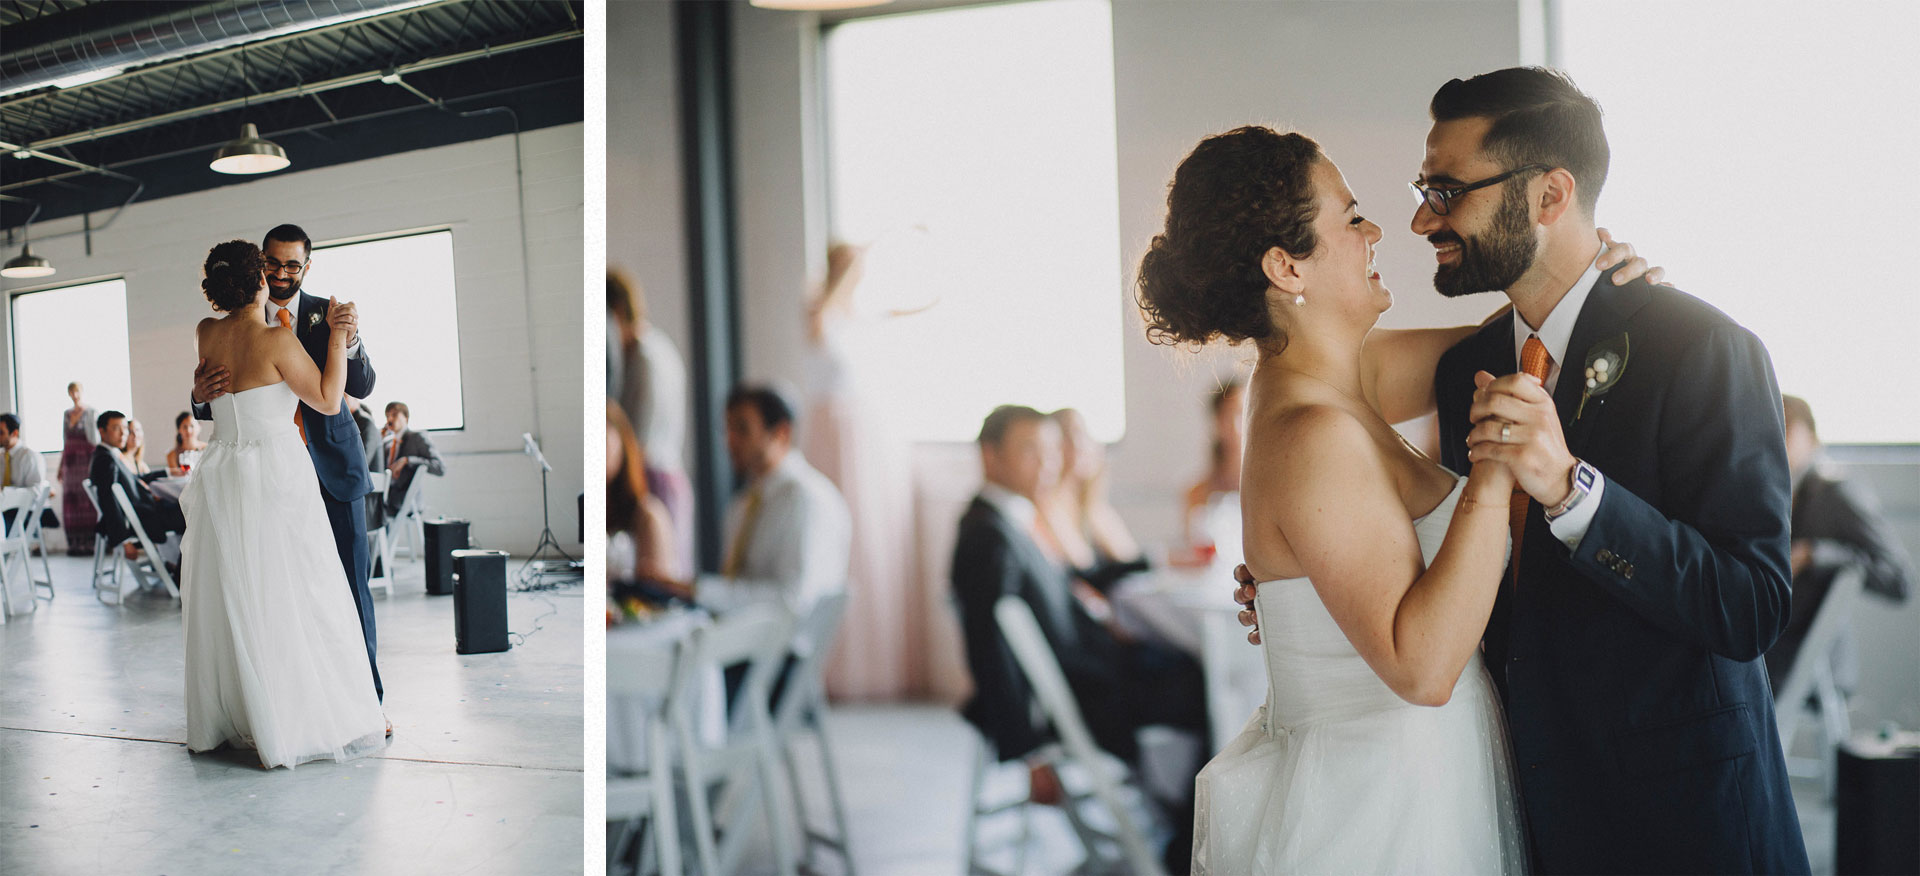 Bethany-Peter-Cincinnati-Pallet-23-Wedding-072.jpg